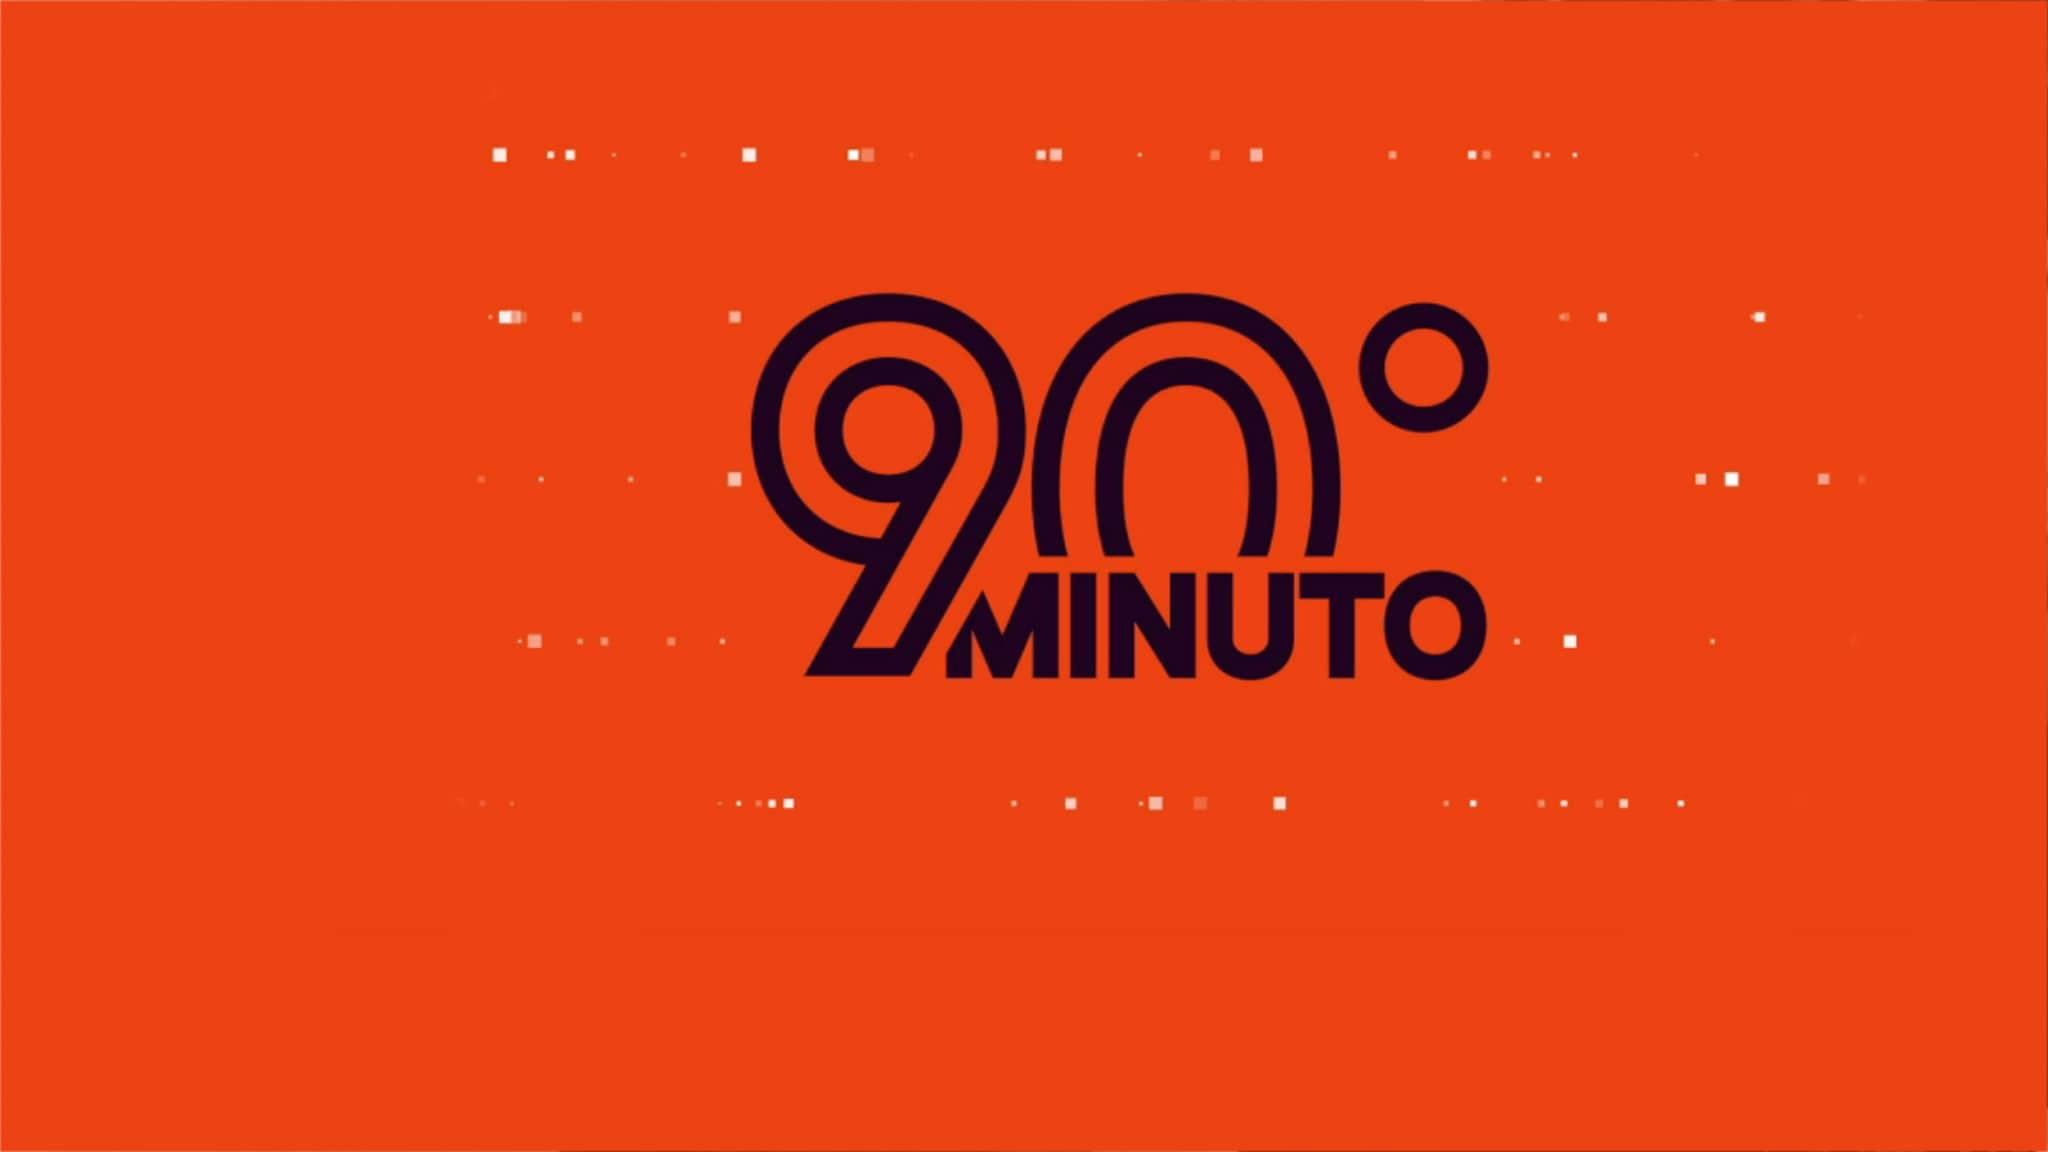 Rai Sport 90° Minuto del Sabato 2019/20